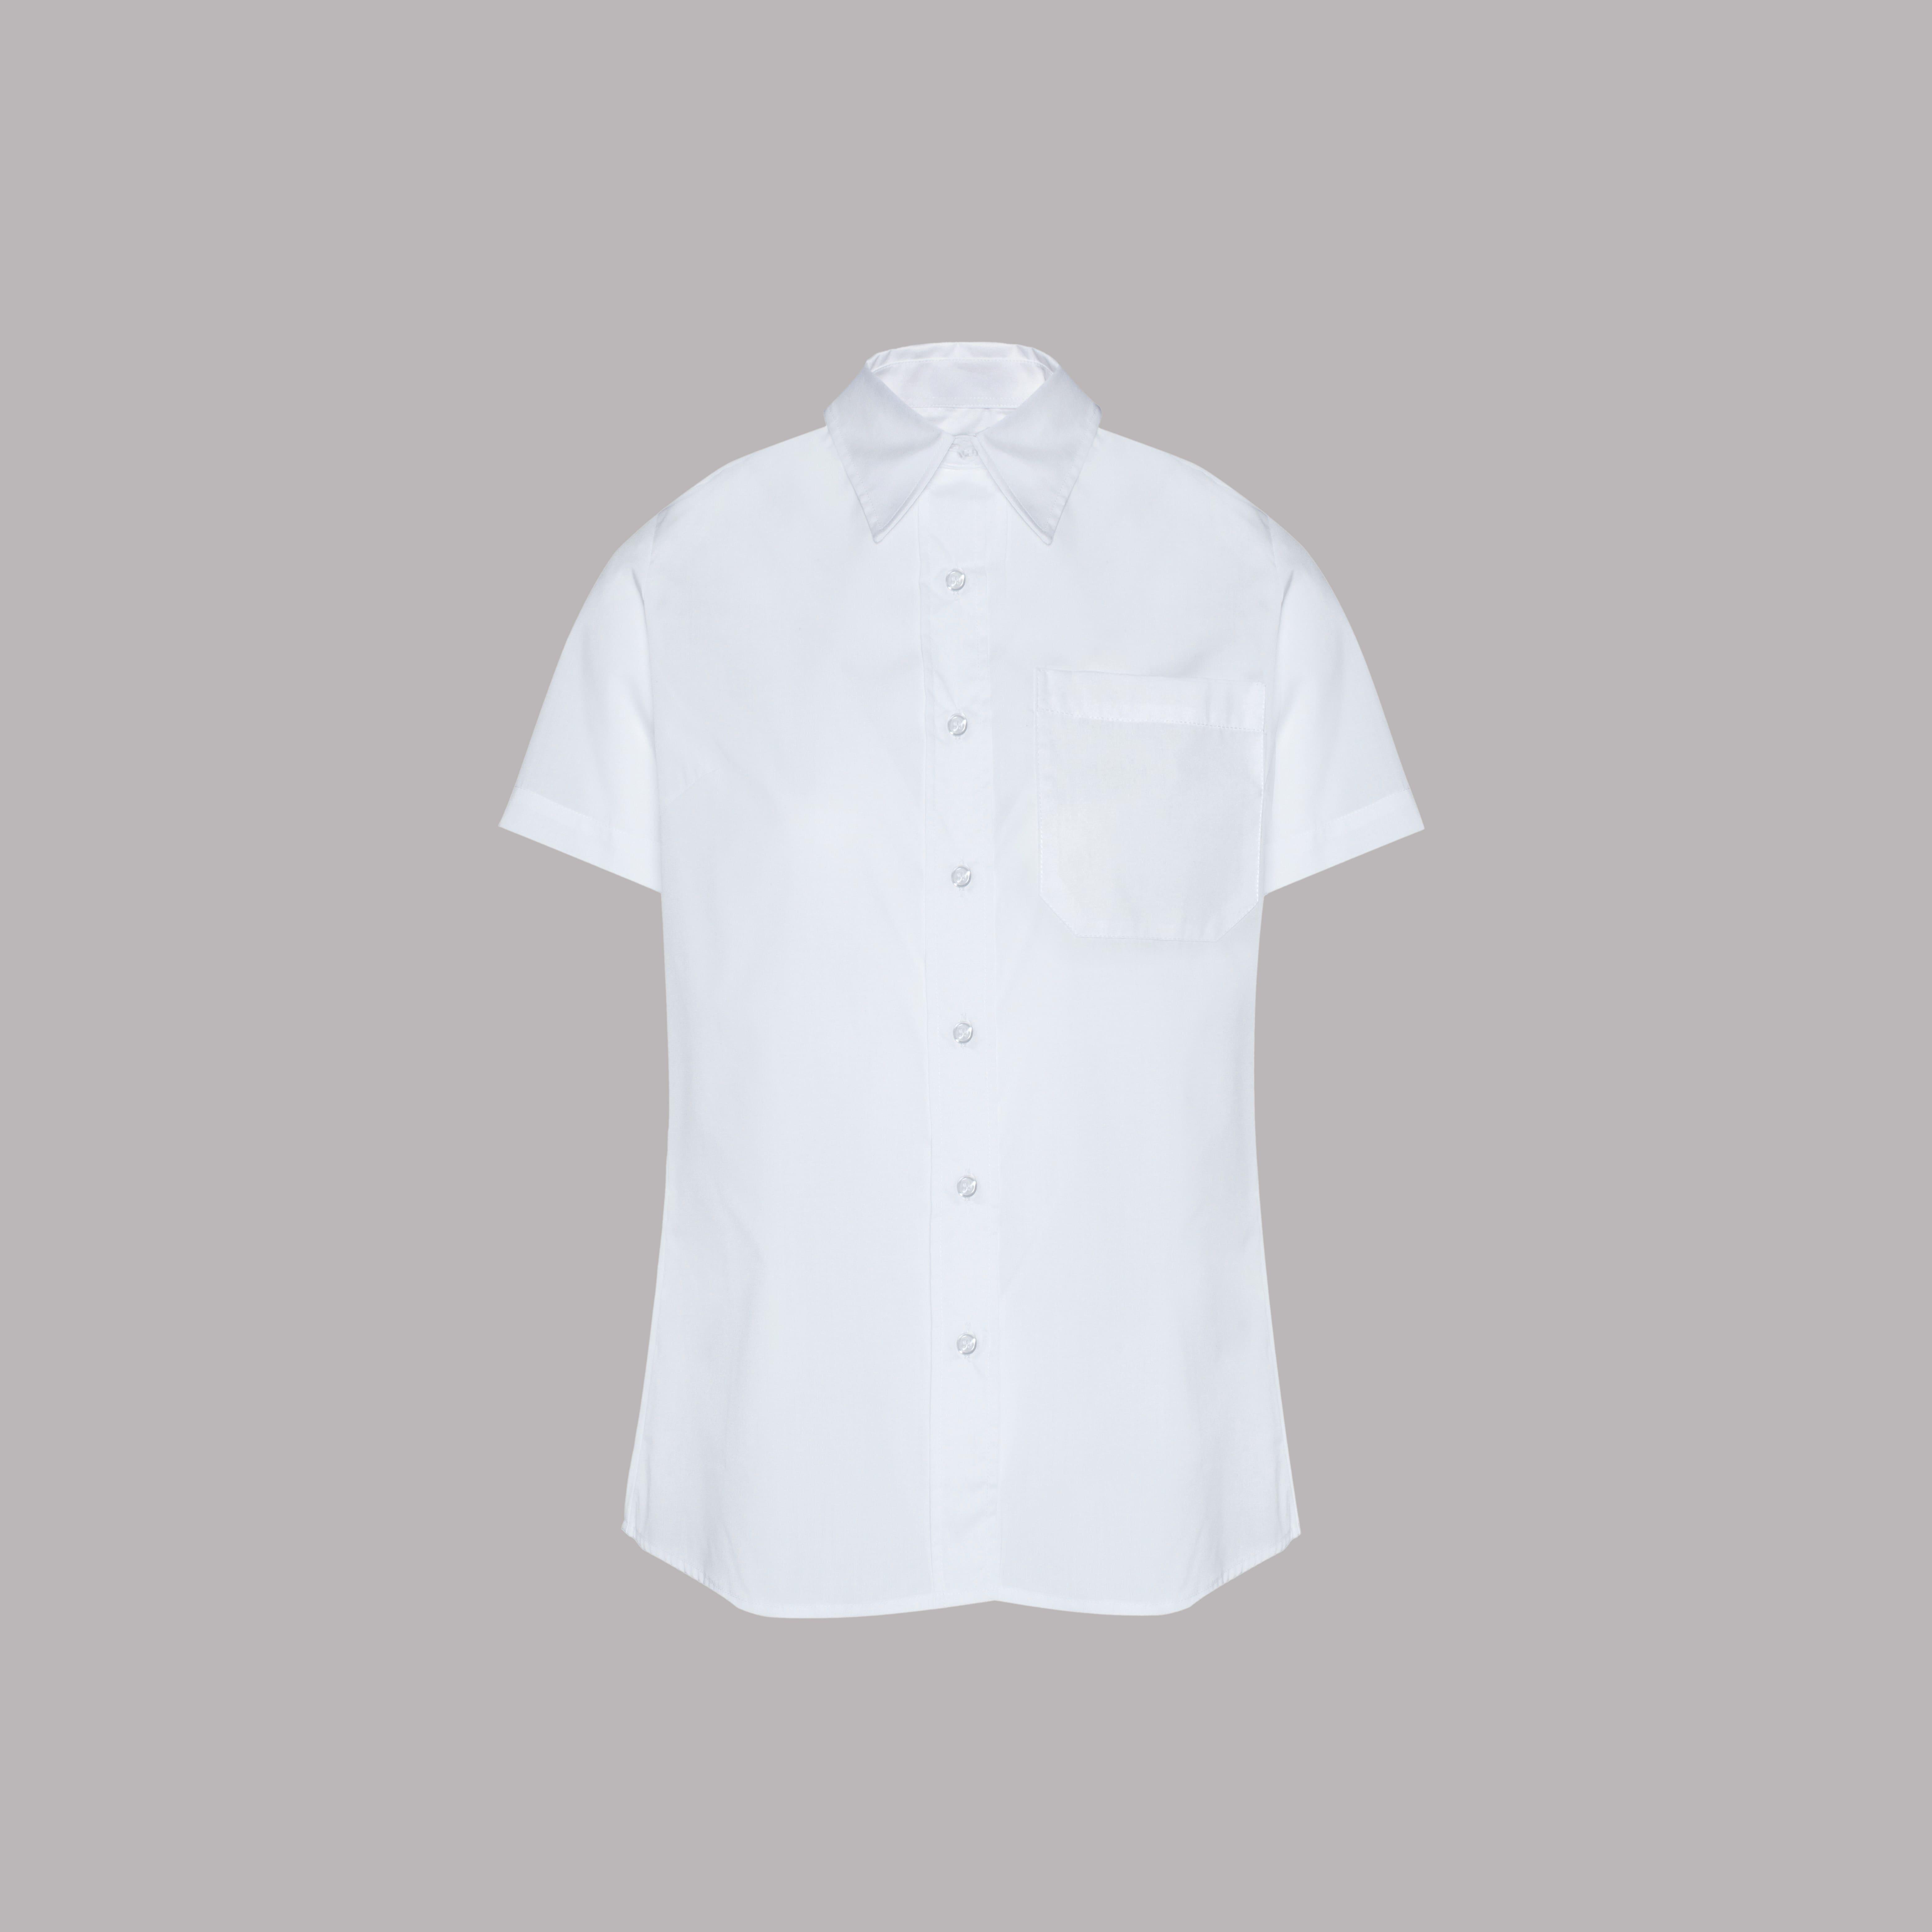 Camisa de Manga Curta de Senhora na cor Branca